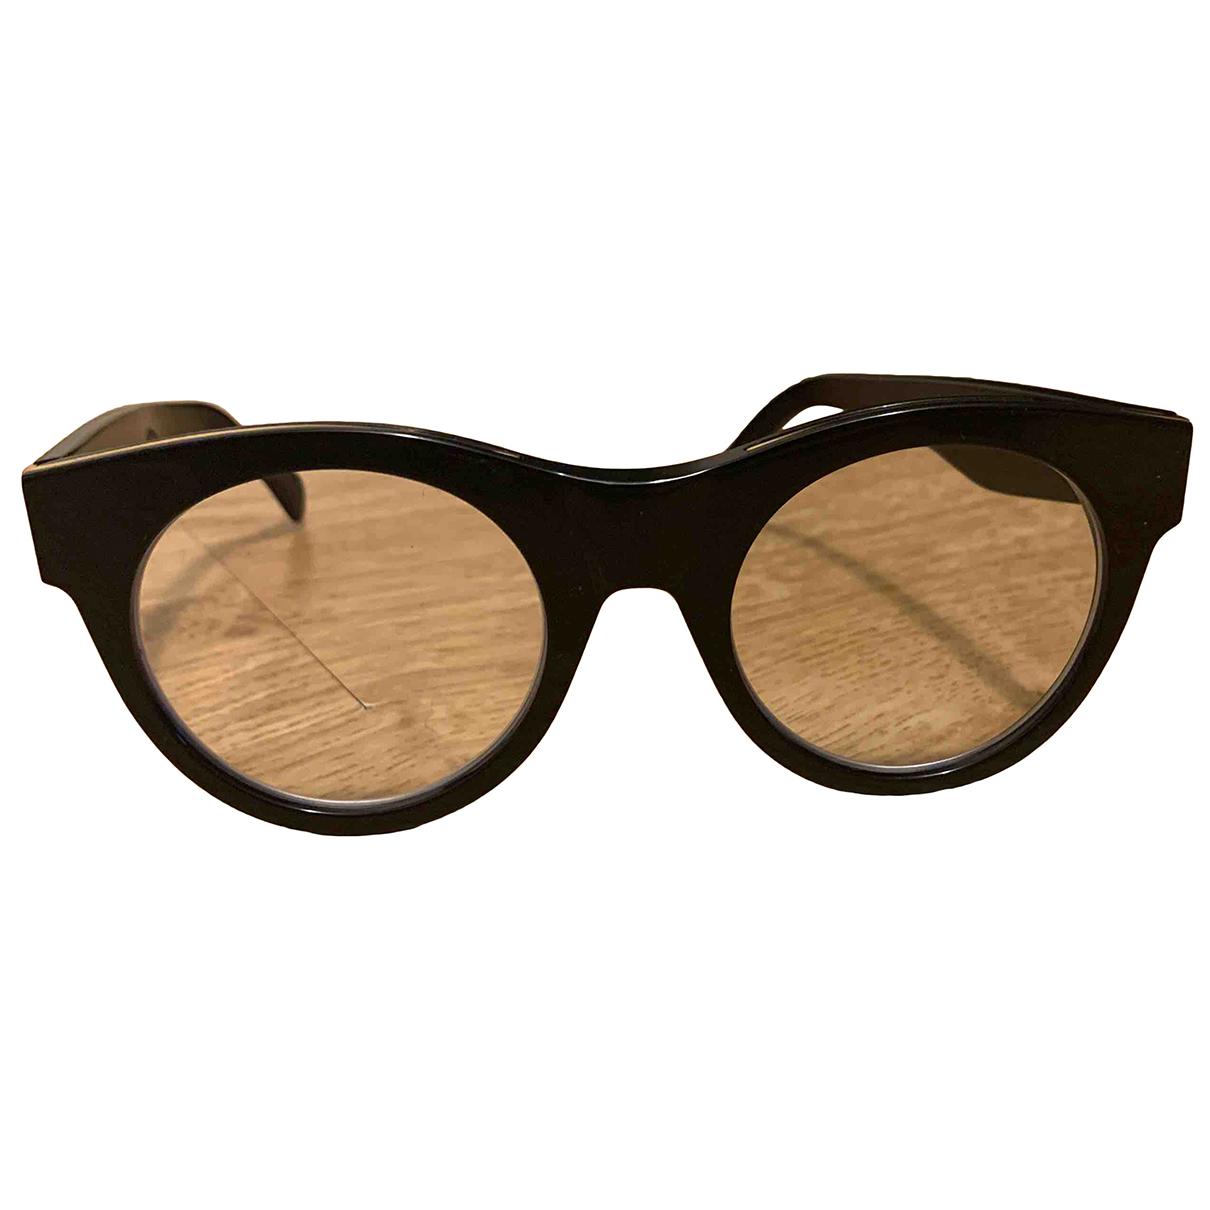 Gafas oversize Bevel Round Celine